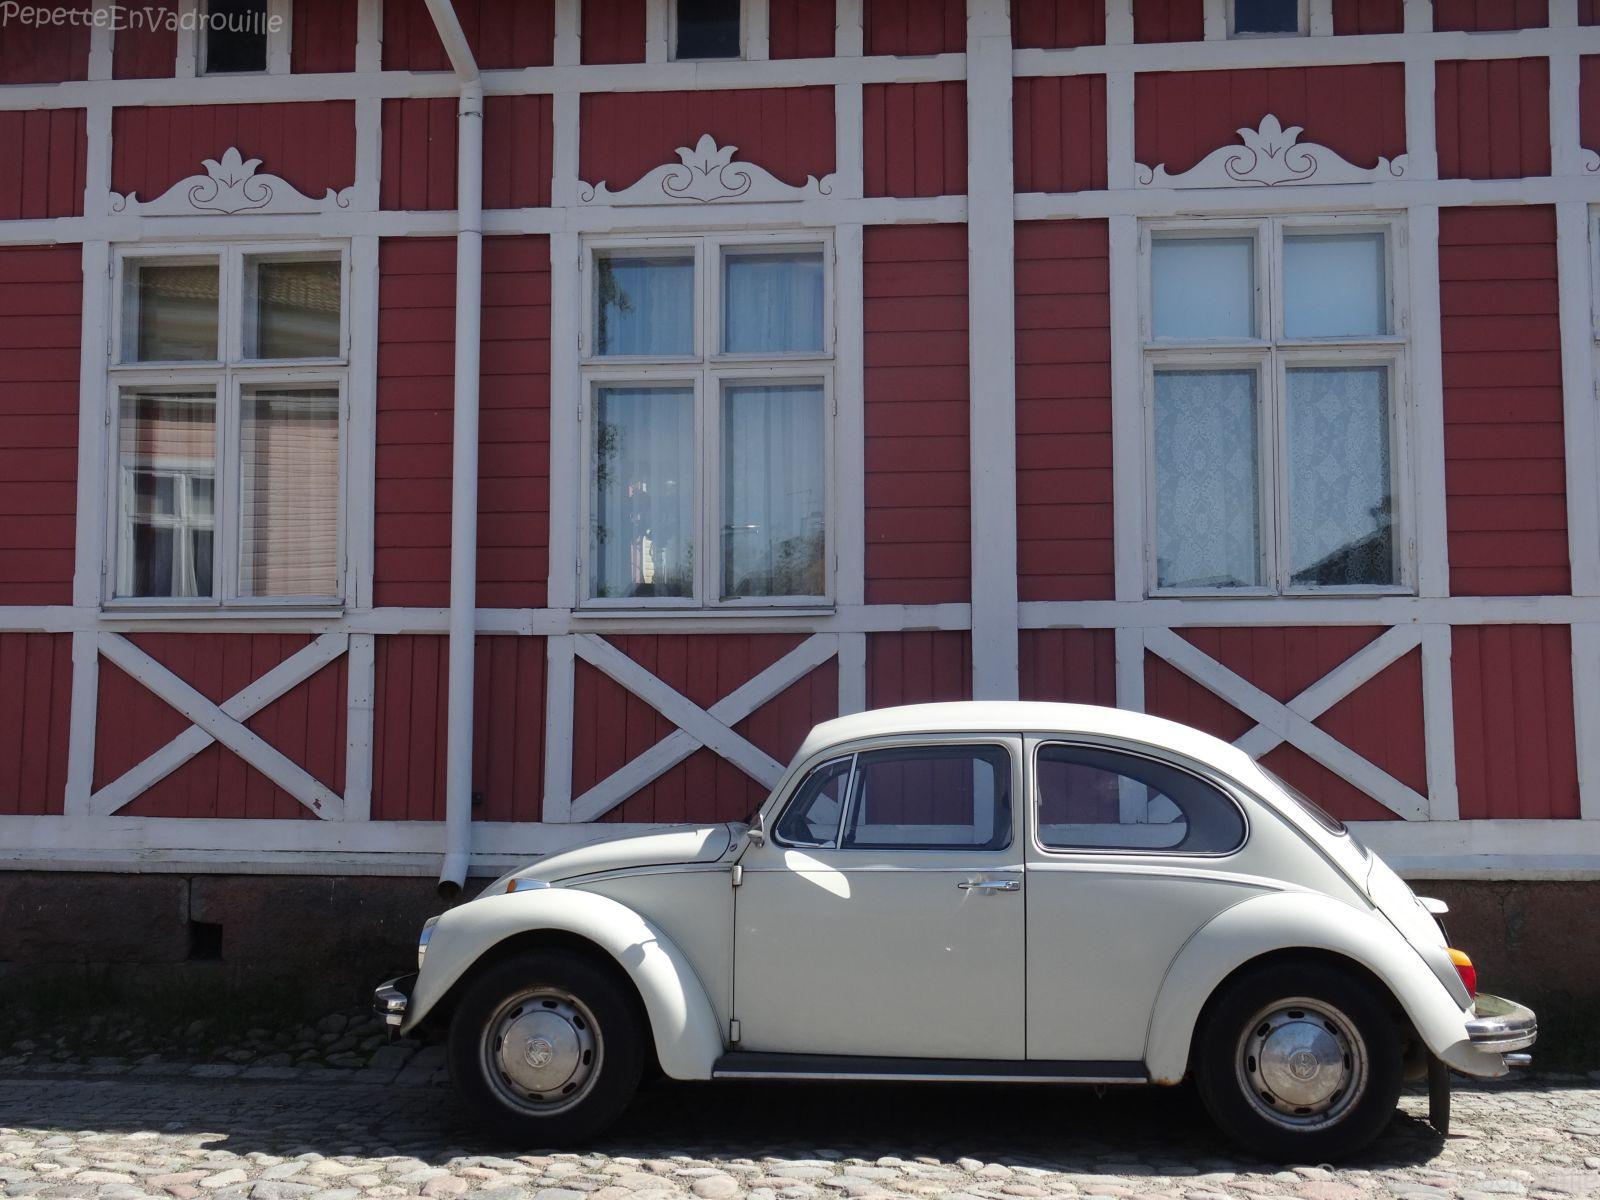 comment bien choisir sa voiture de location pepetteenvadrouille. Black Bedroom Furniture Sets. Home Design Ideas